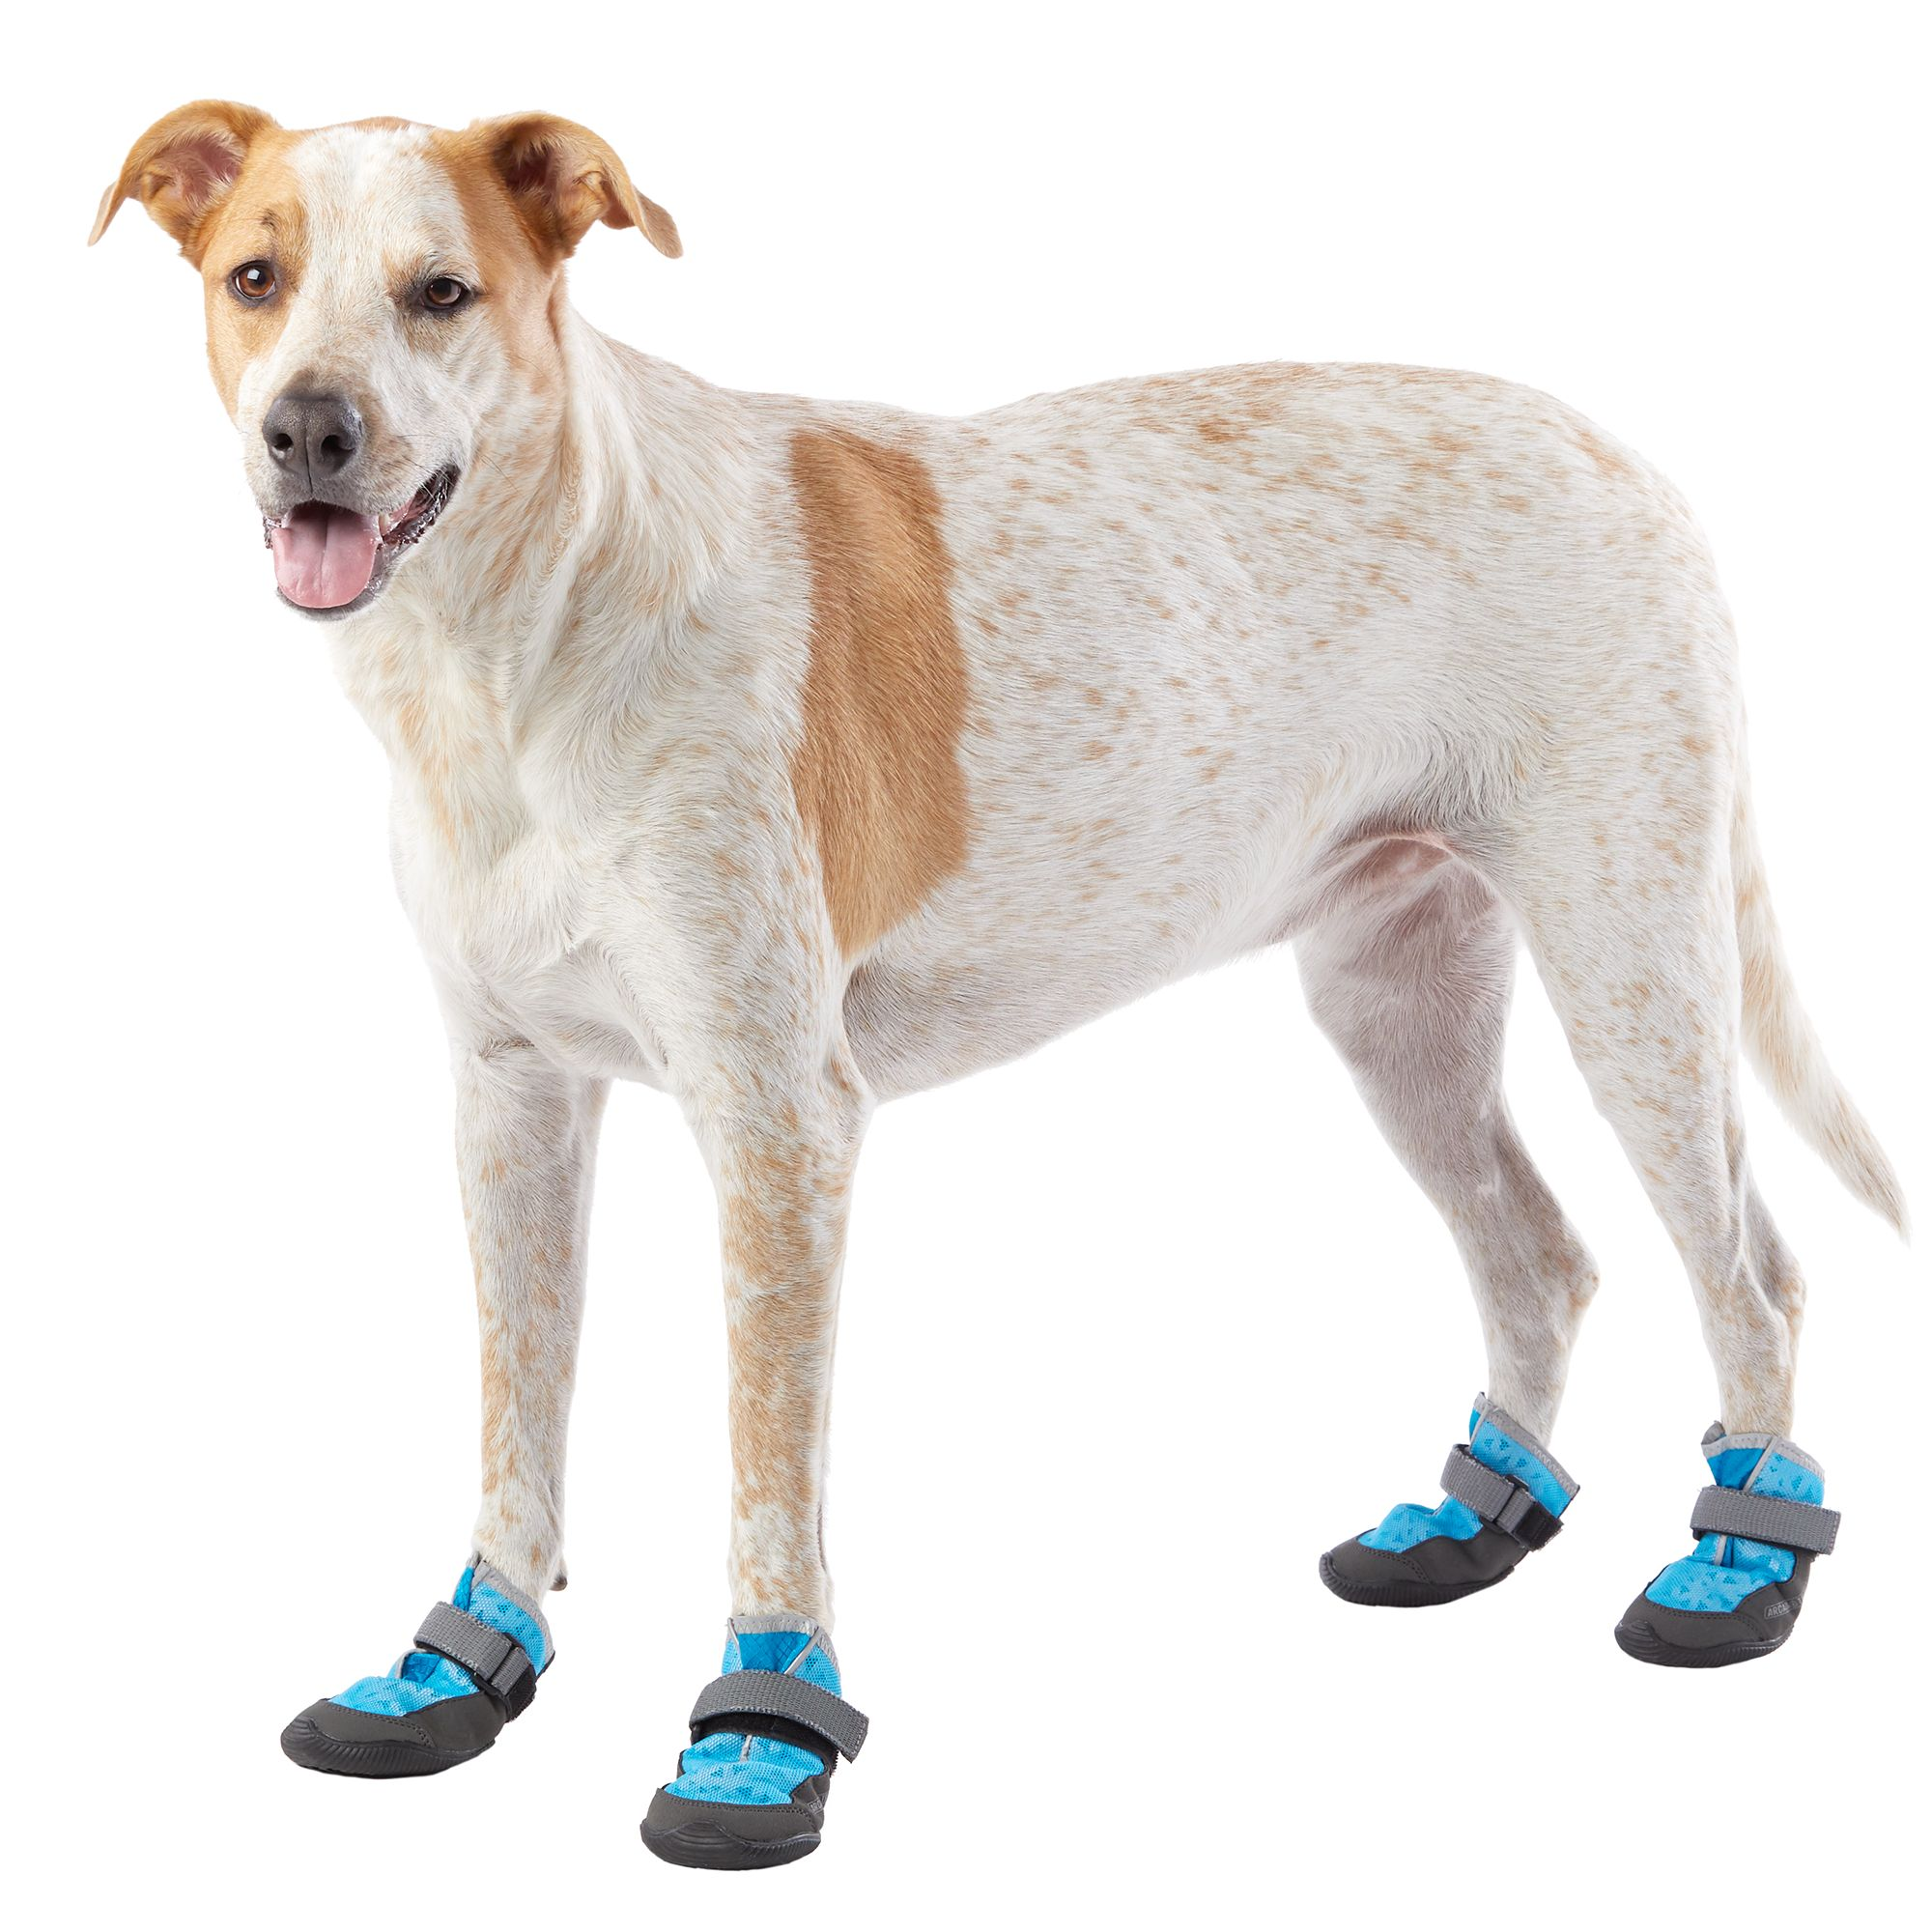 Arcadia Trail Dog Boots Reflective Non